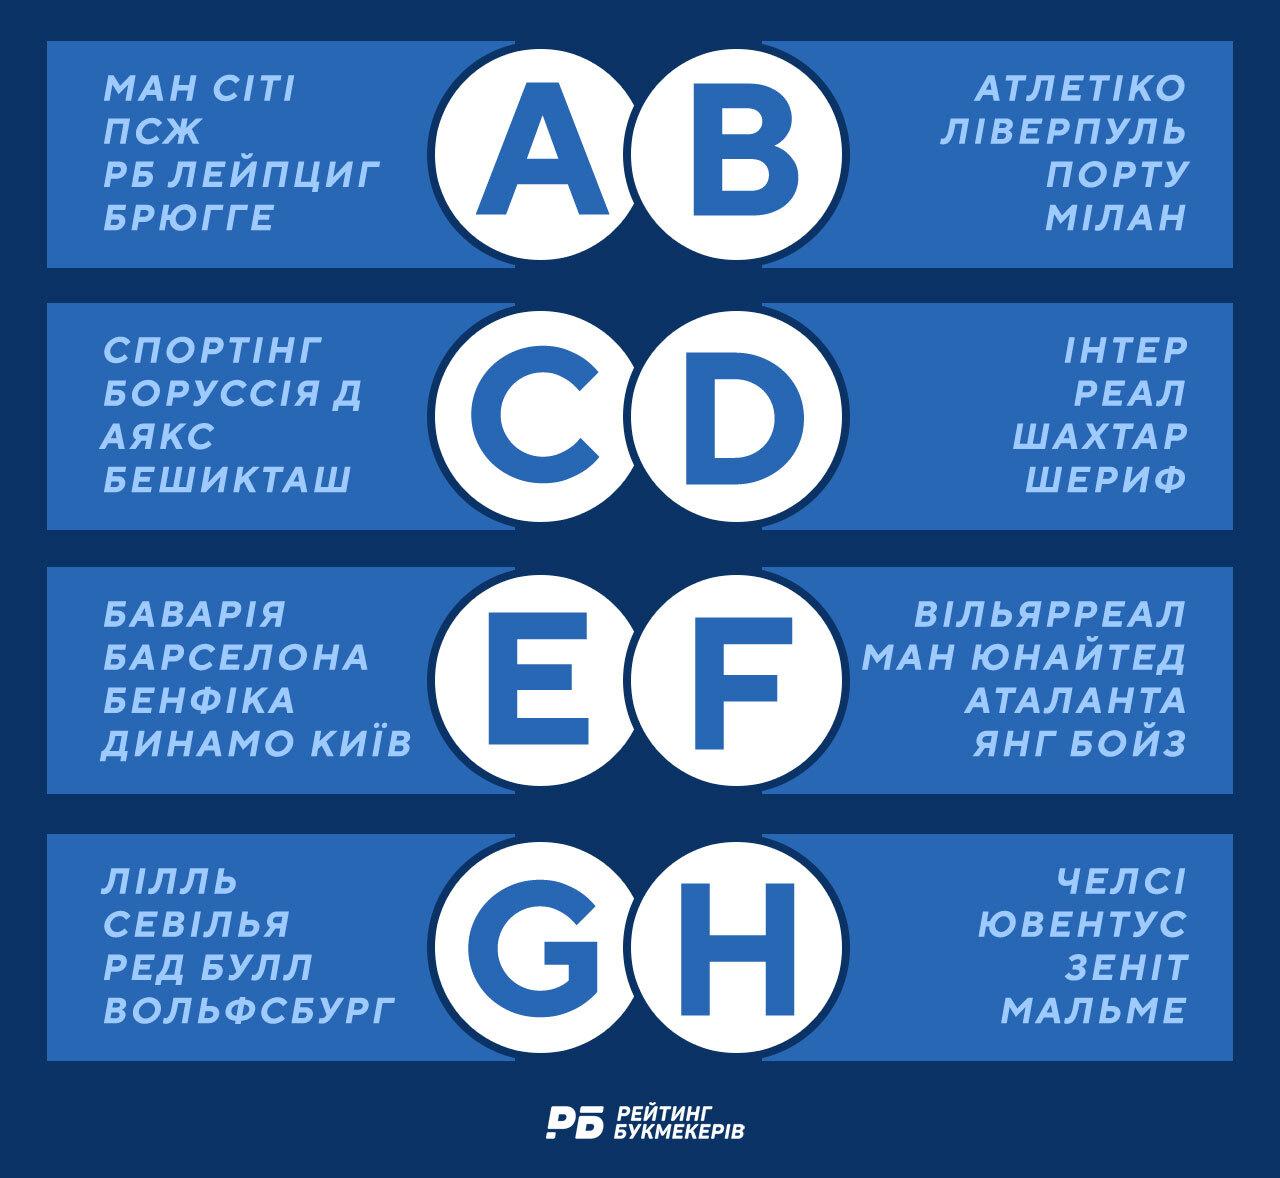 «Шахтар» Донецьк: Ліга чемпіонів 2021-22